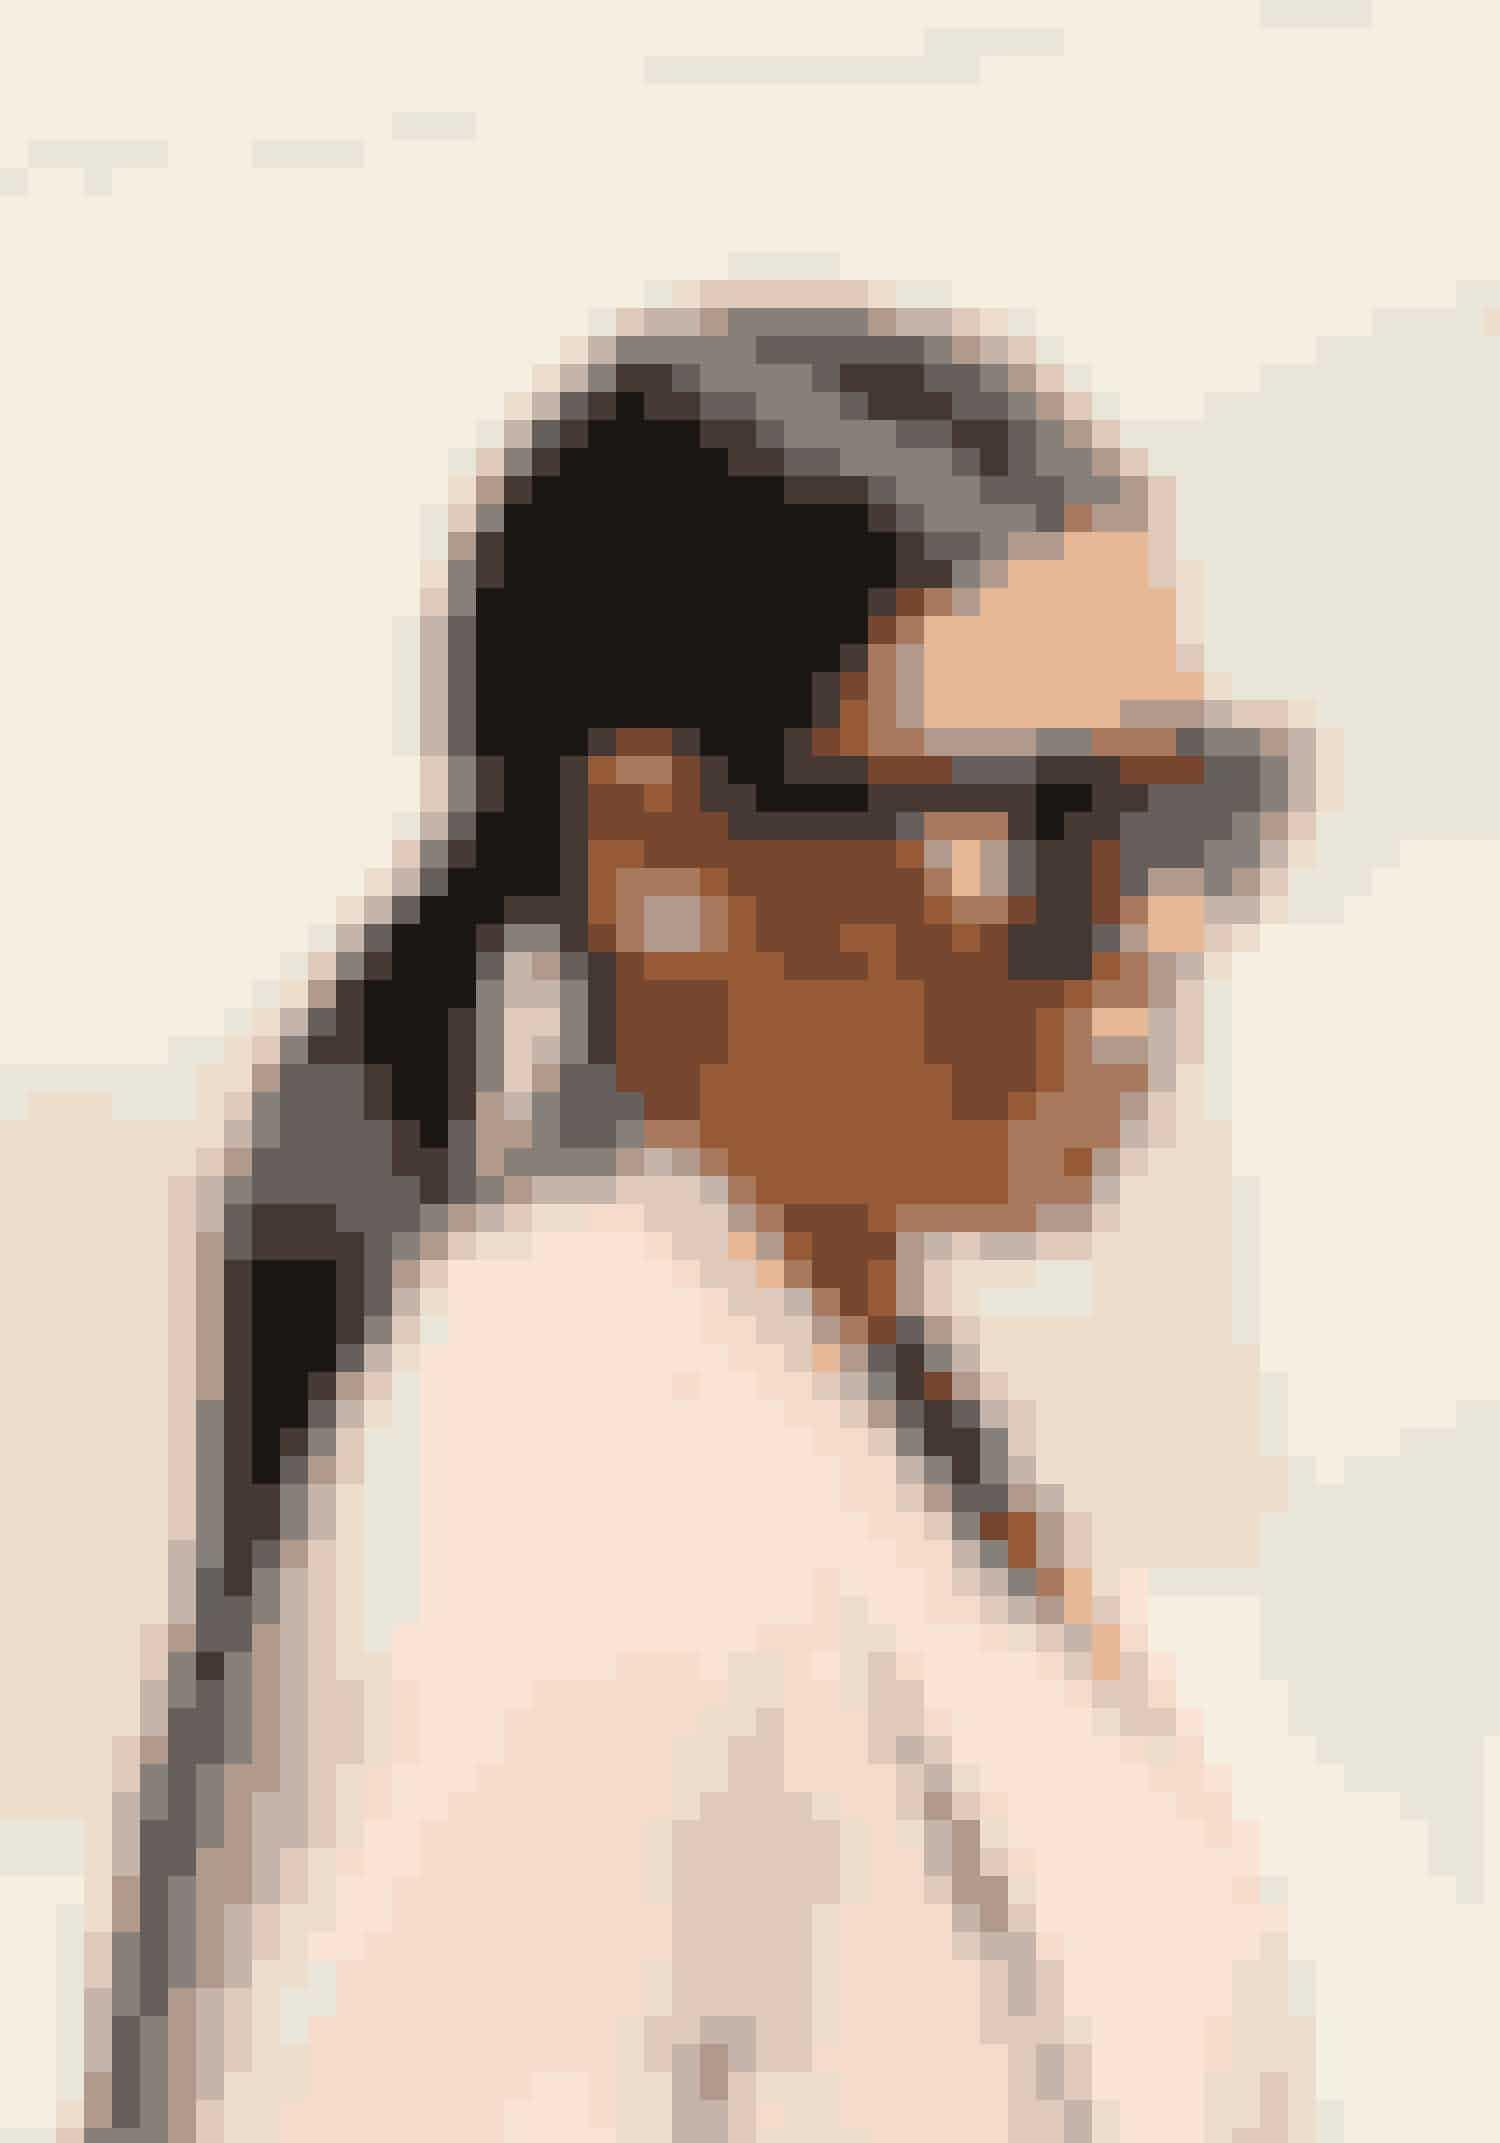 Kim KardashianKim Kardashian spottet på vej fra operaen i 2015 med en klassisk sleek lavt siddende hestehale.